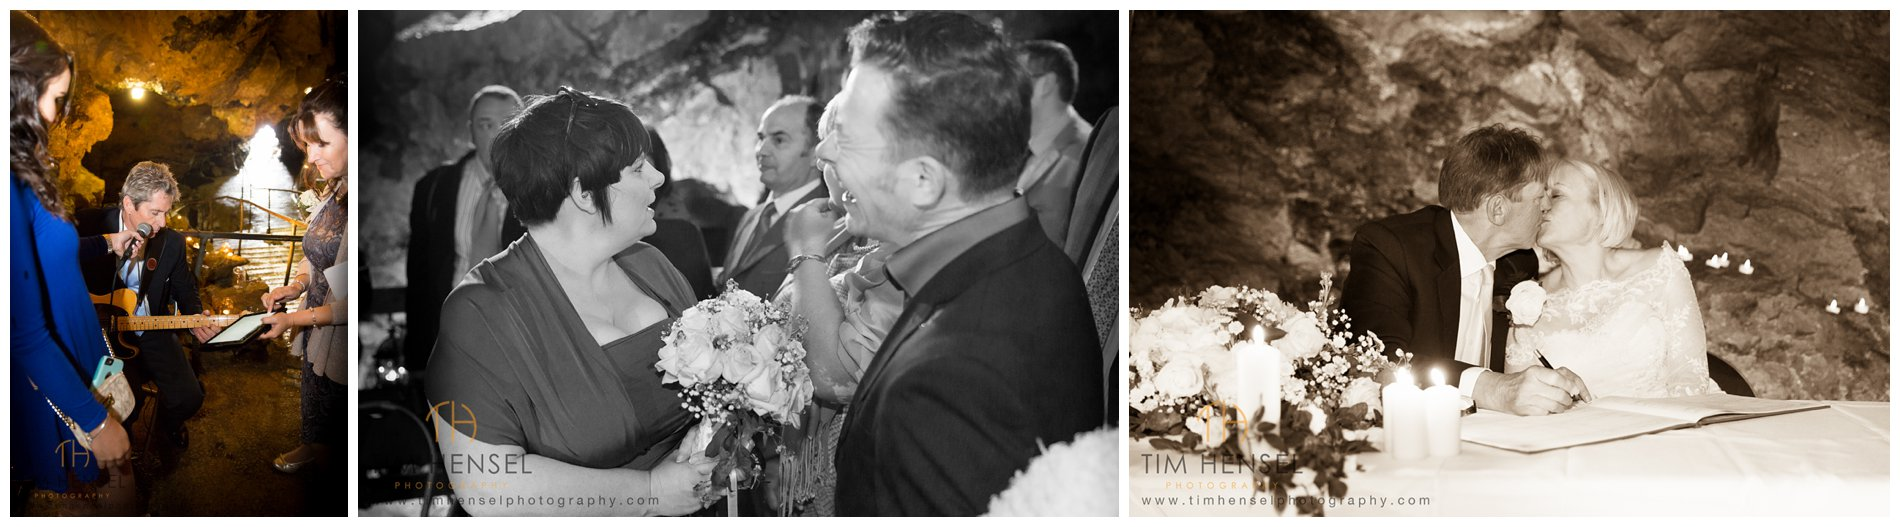 Wedding photography in Castleton, Derbyshire - in Treak Cliff Cavern